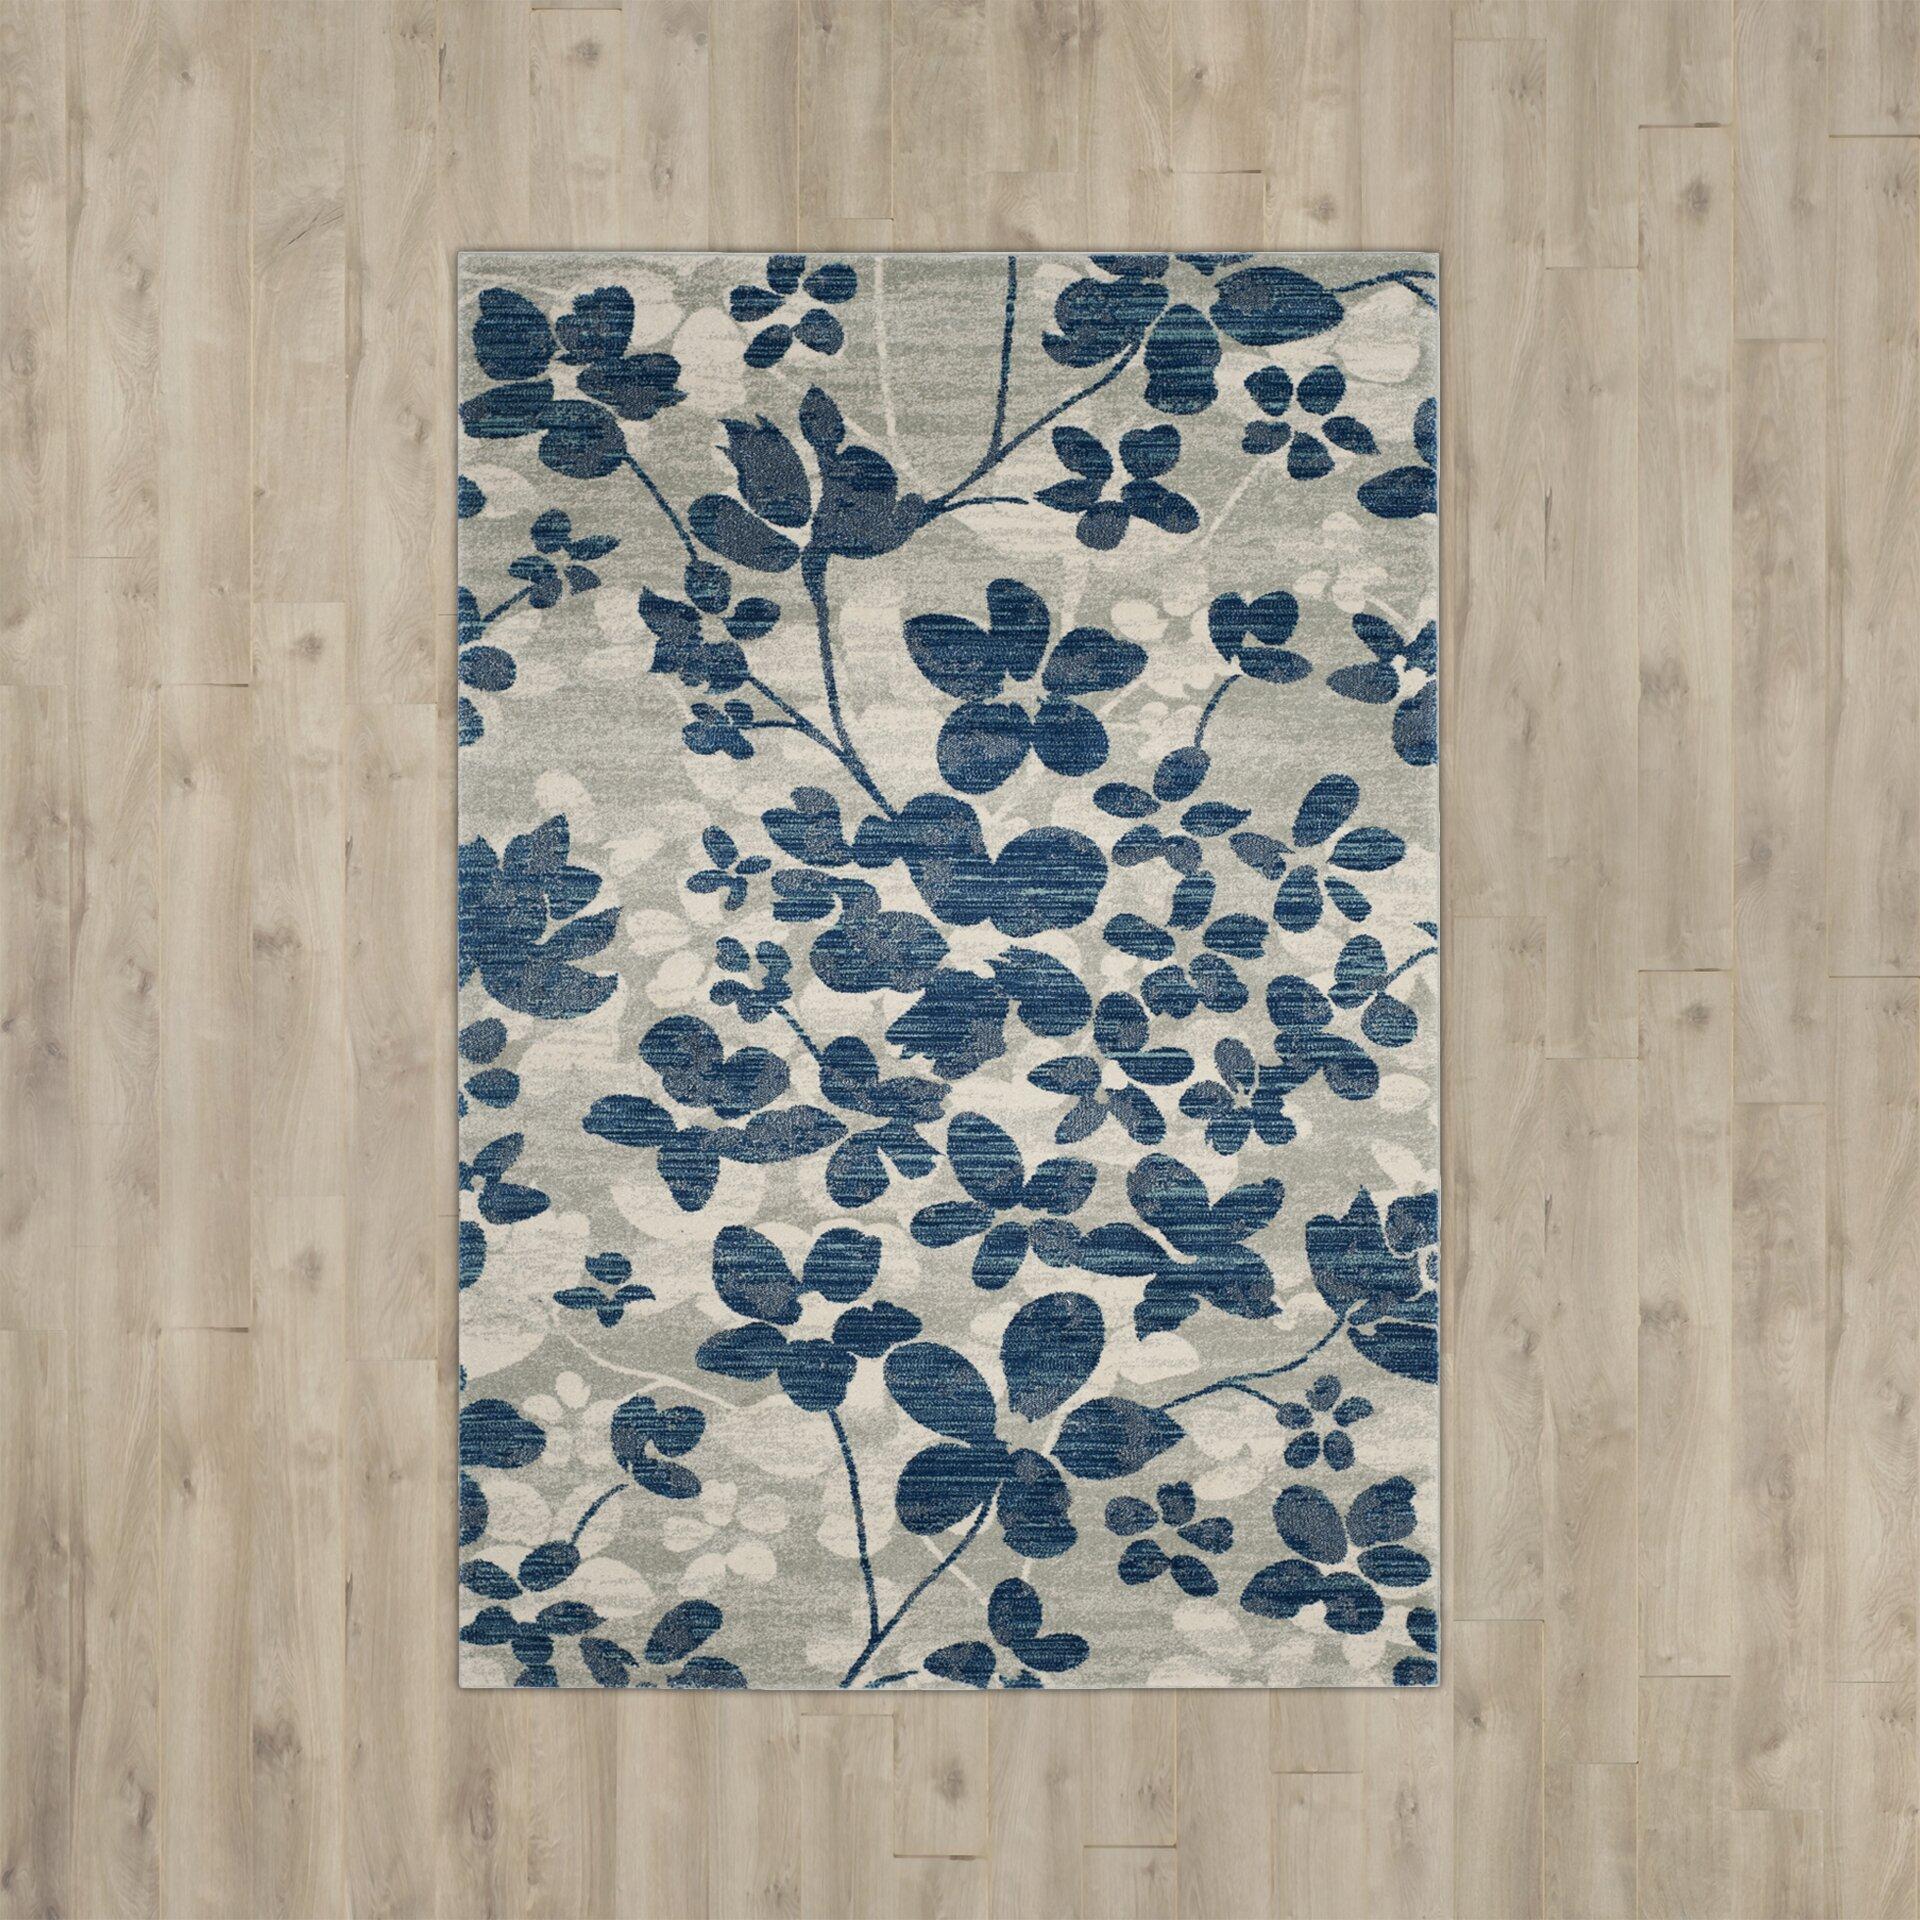 andover mills aegean grey light blue area rug reviews wayfair. Black Bedroom Furniture Sets. Home Design Ideas